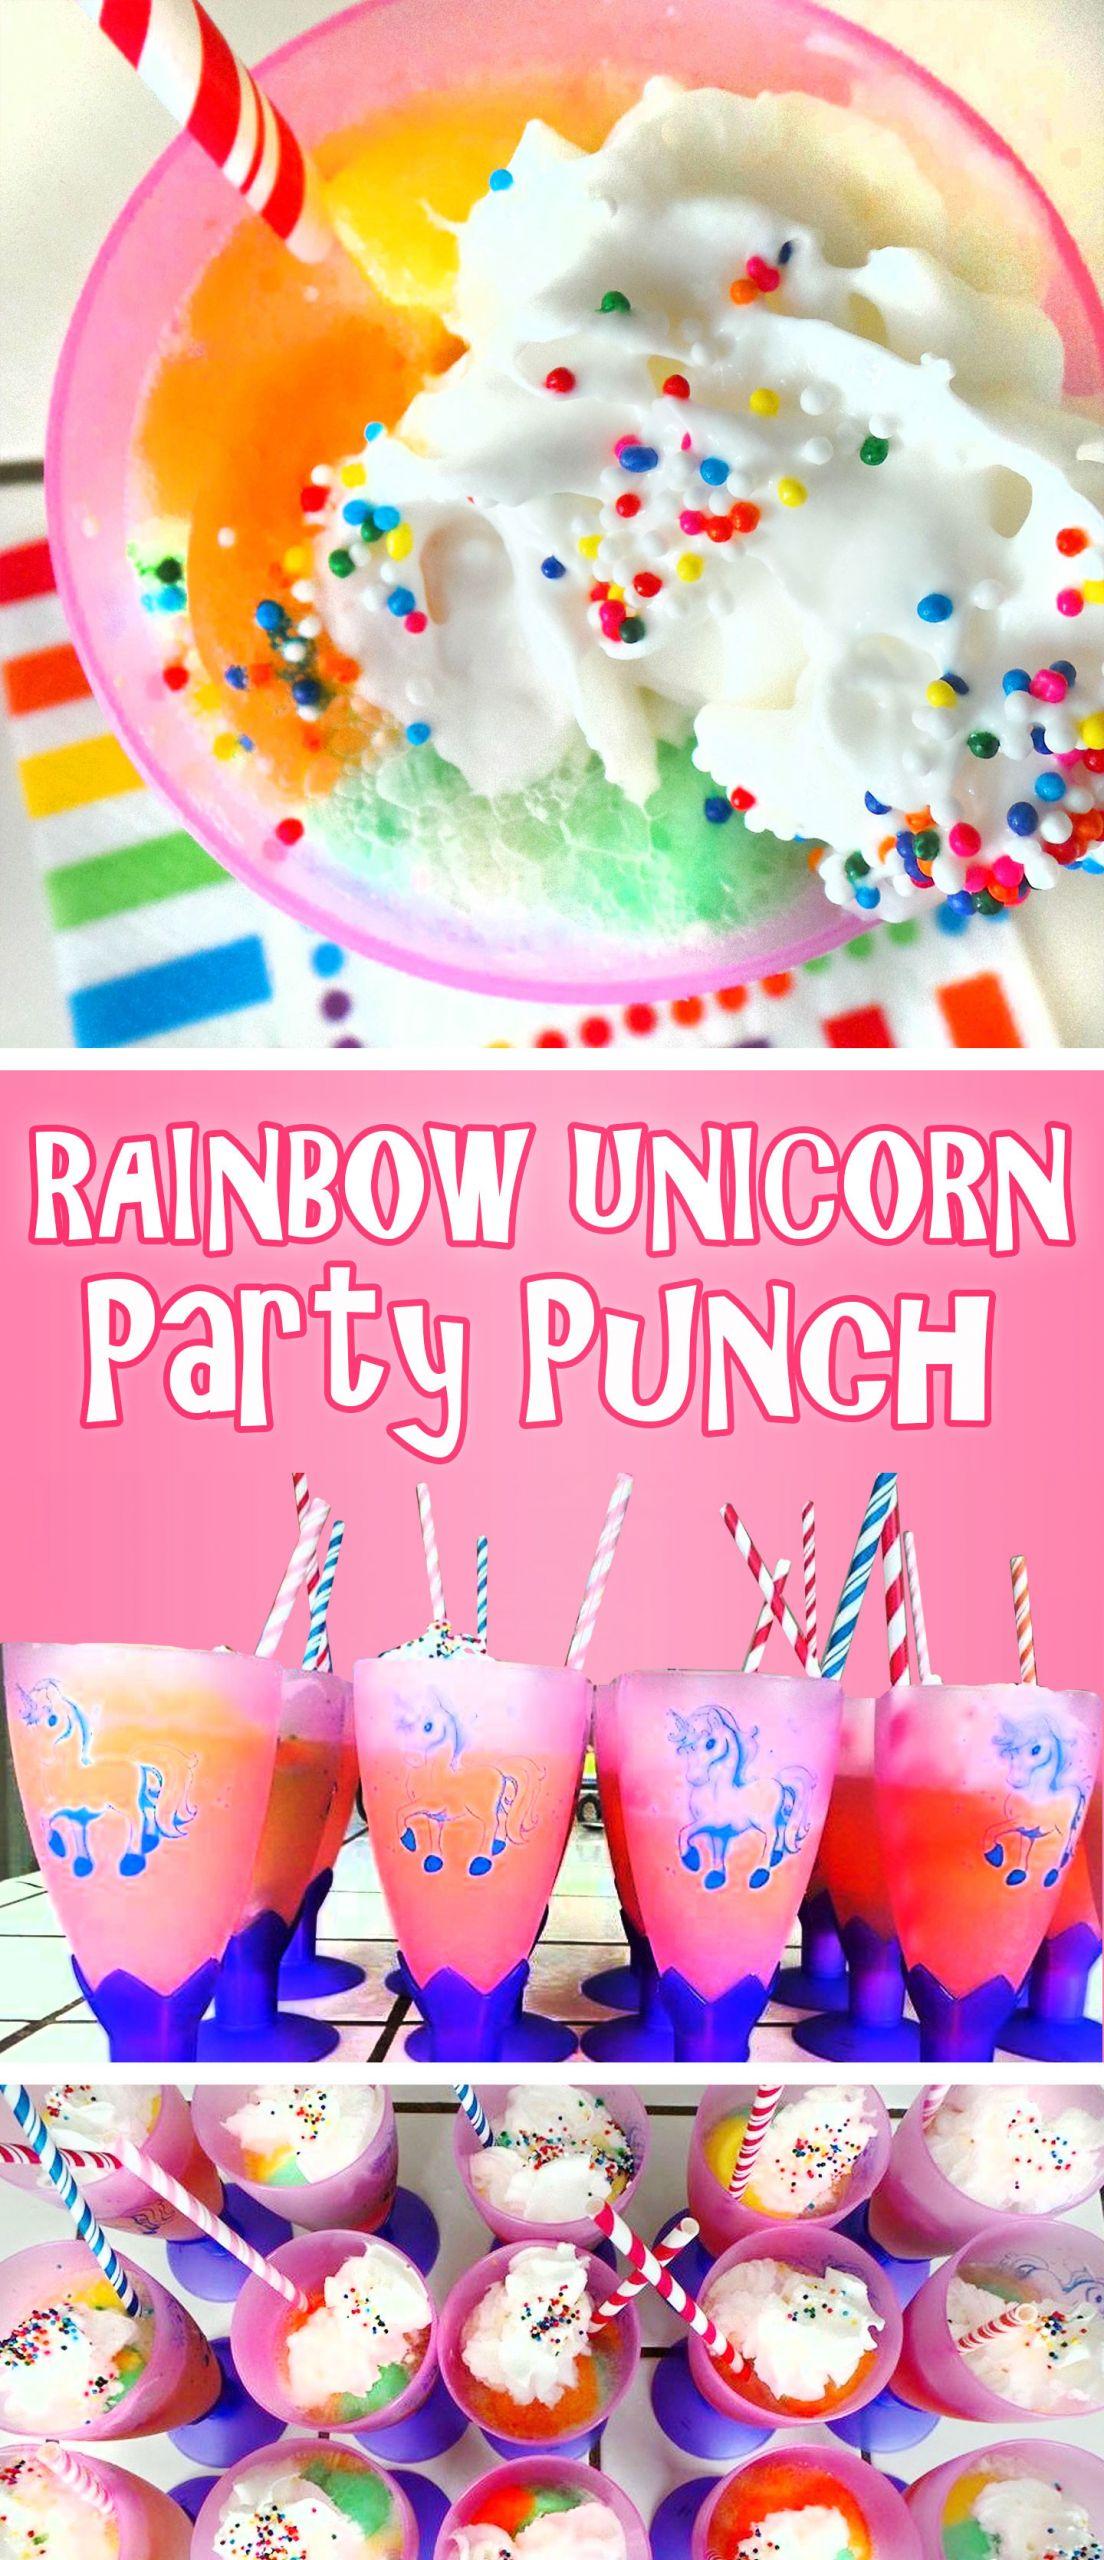 Unicorn And Rainbow Party Ideas  Rainbow Unicorn Party Punch